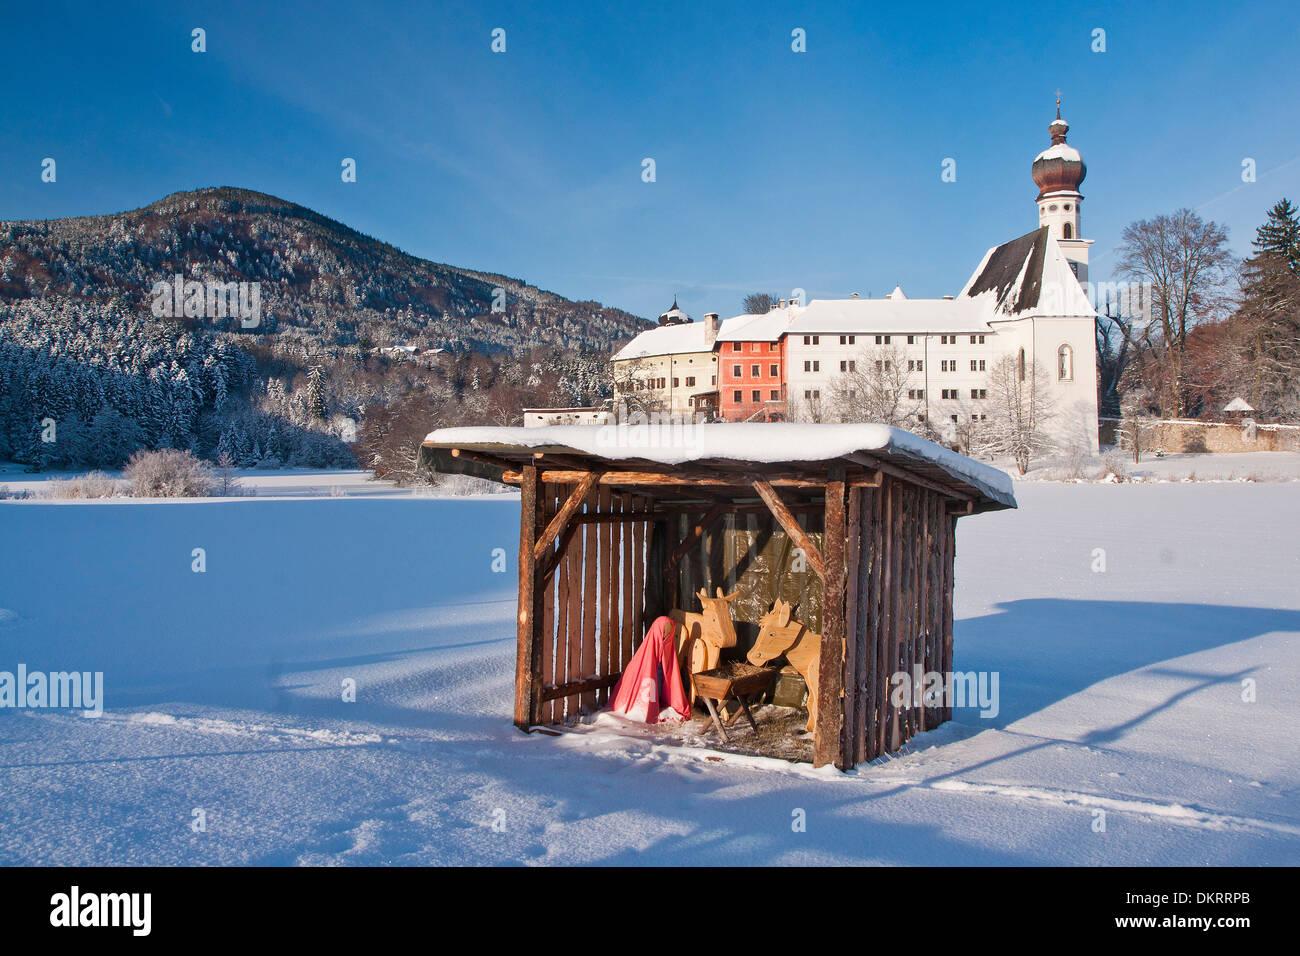 berchtesgadener christmas stockfotos berchtesgadener. Black Bedroom Furniture Sets. Home Design Ideas